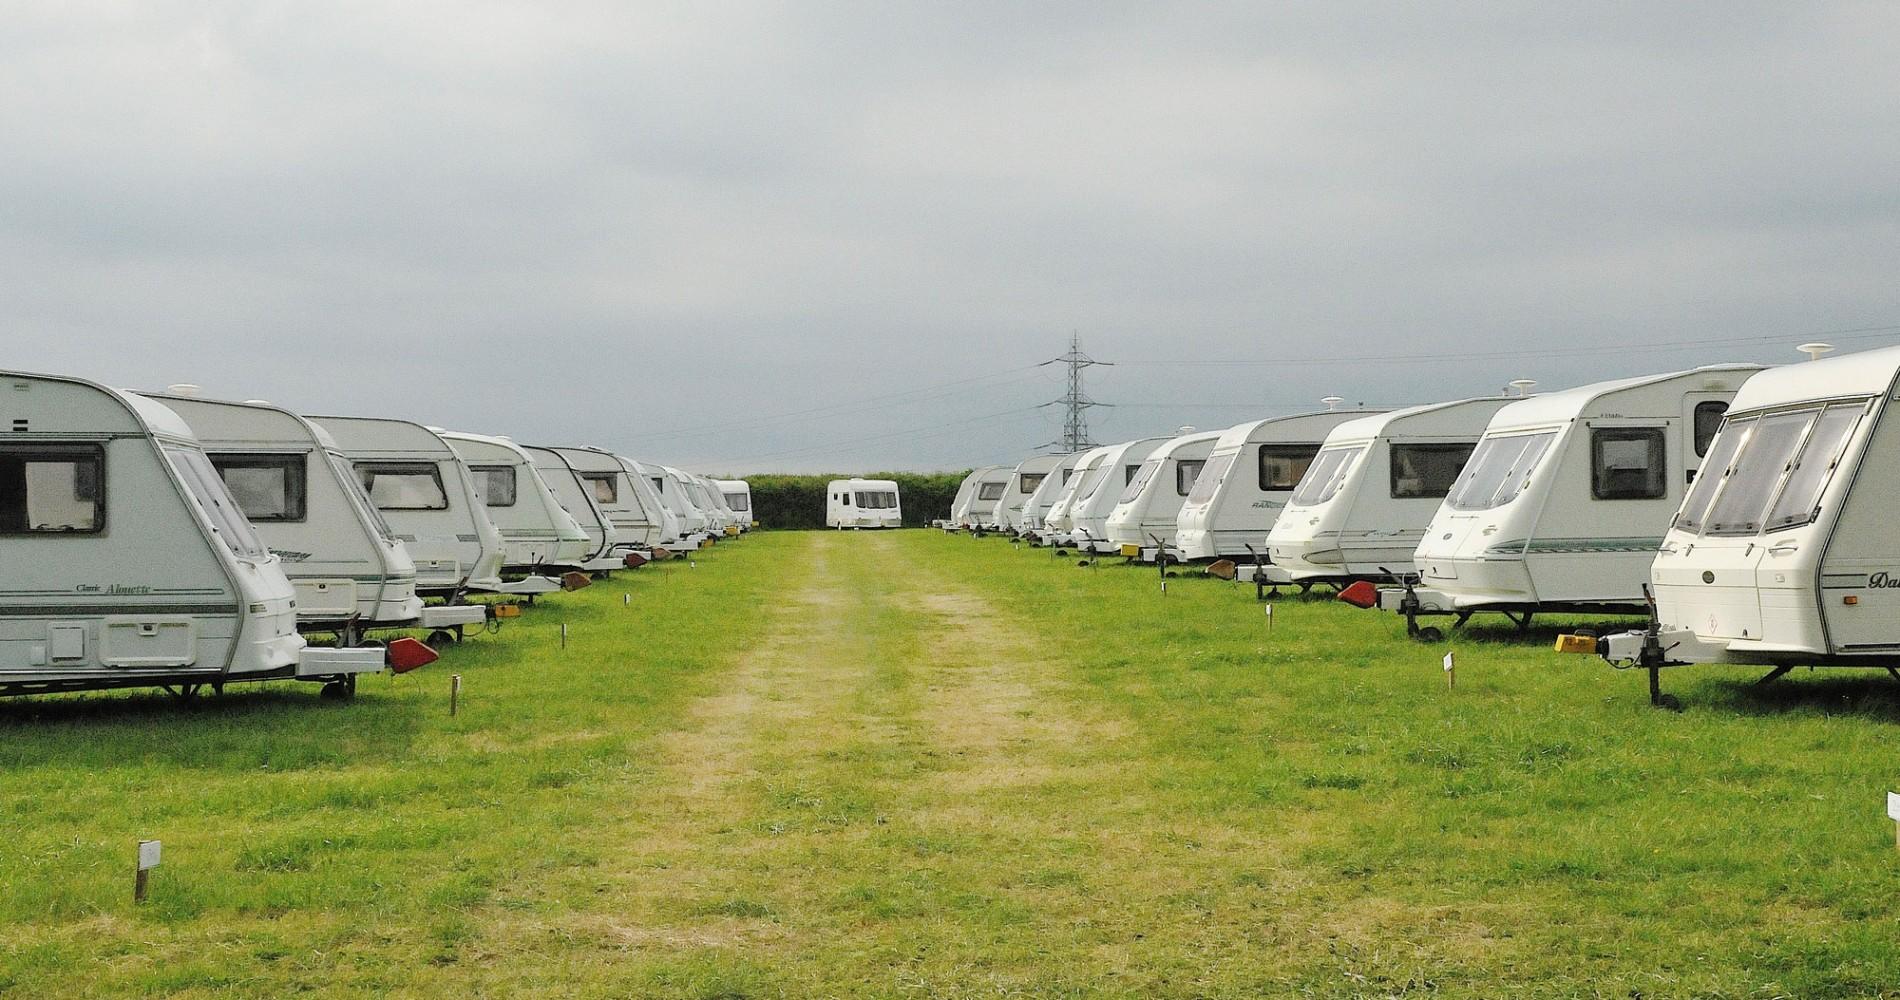 Caravan row